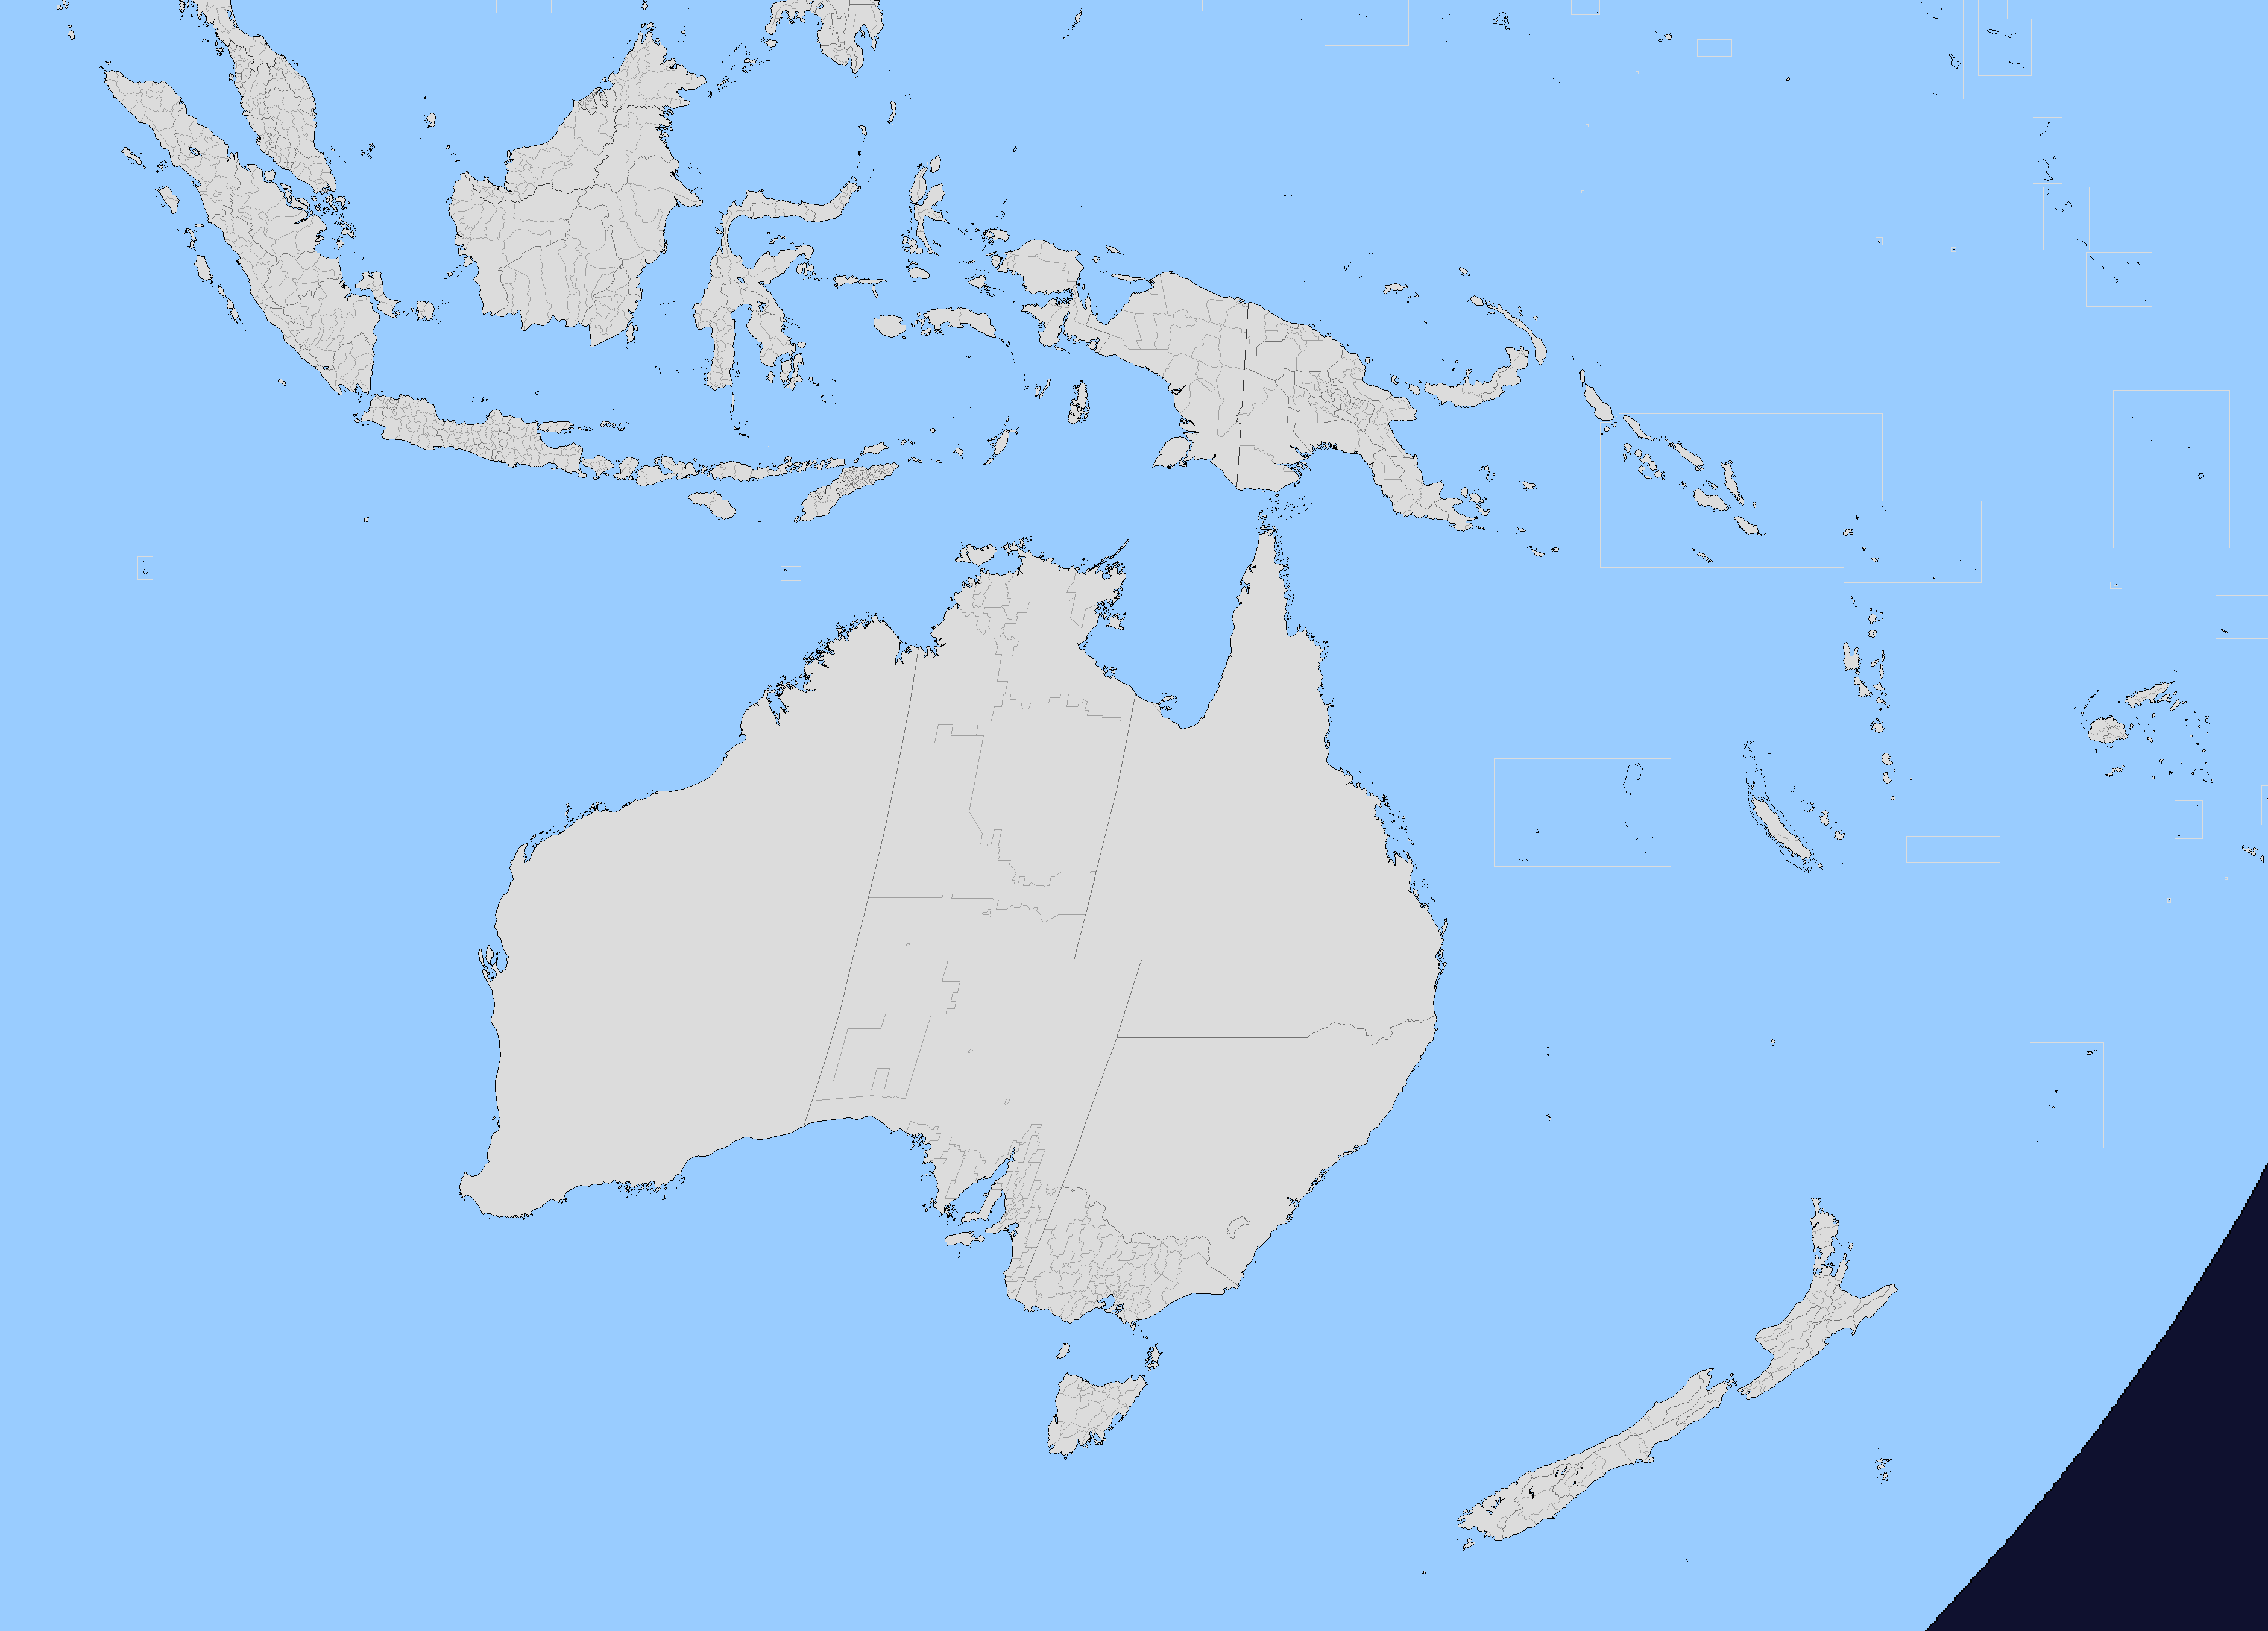 Australien_Neuseeland_und_Indonesische_Inselgruppe.png